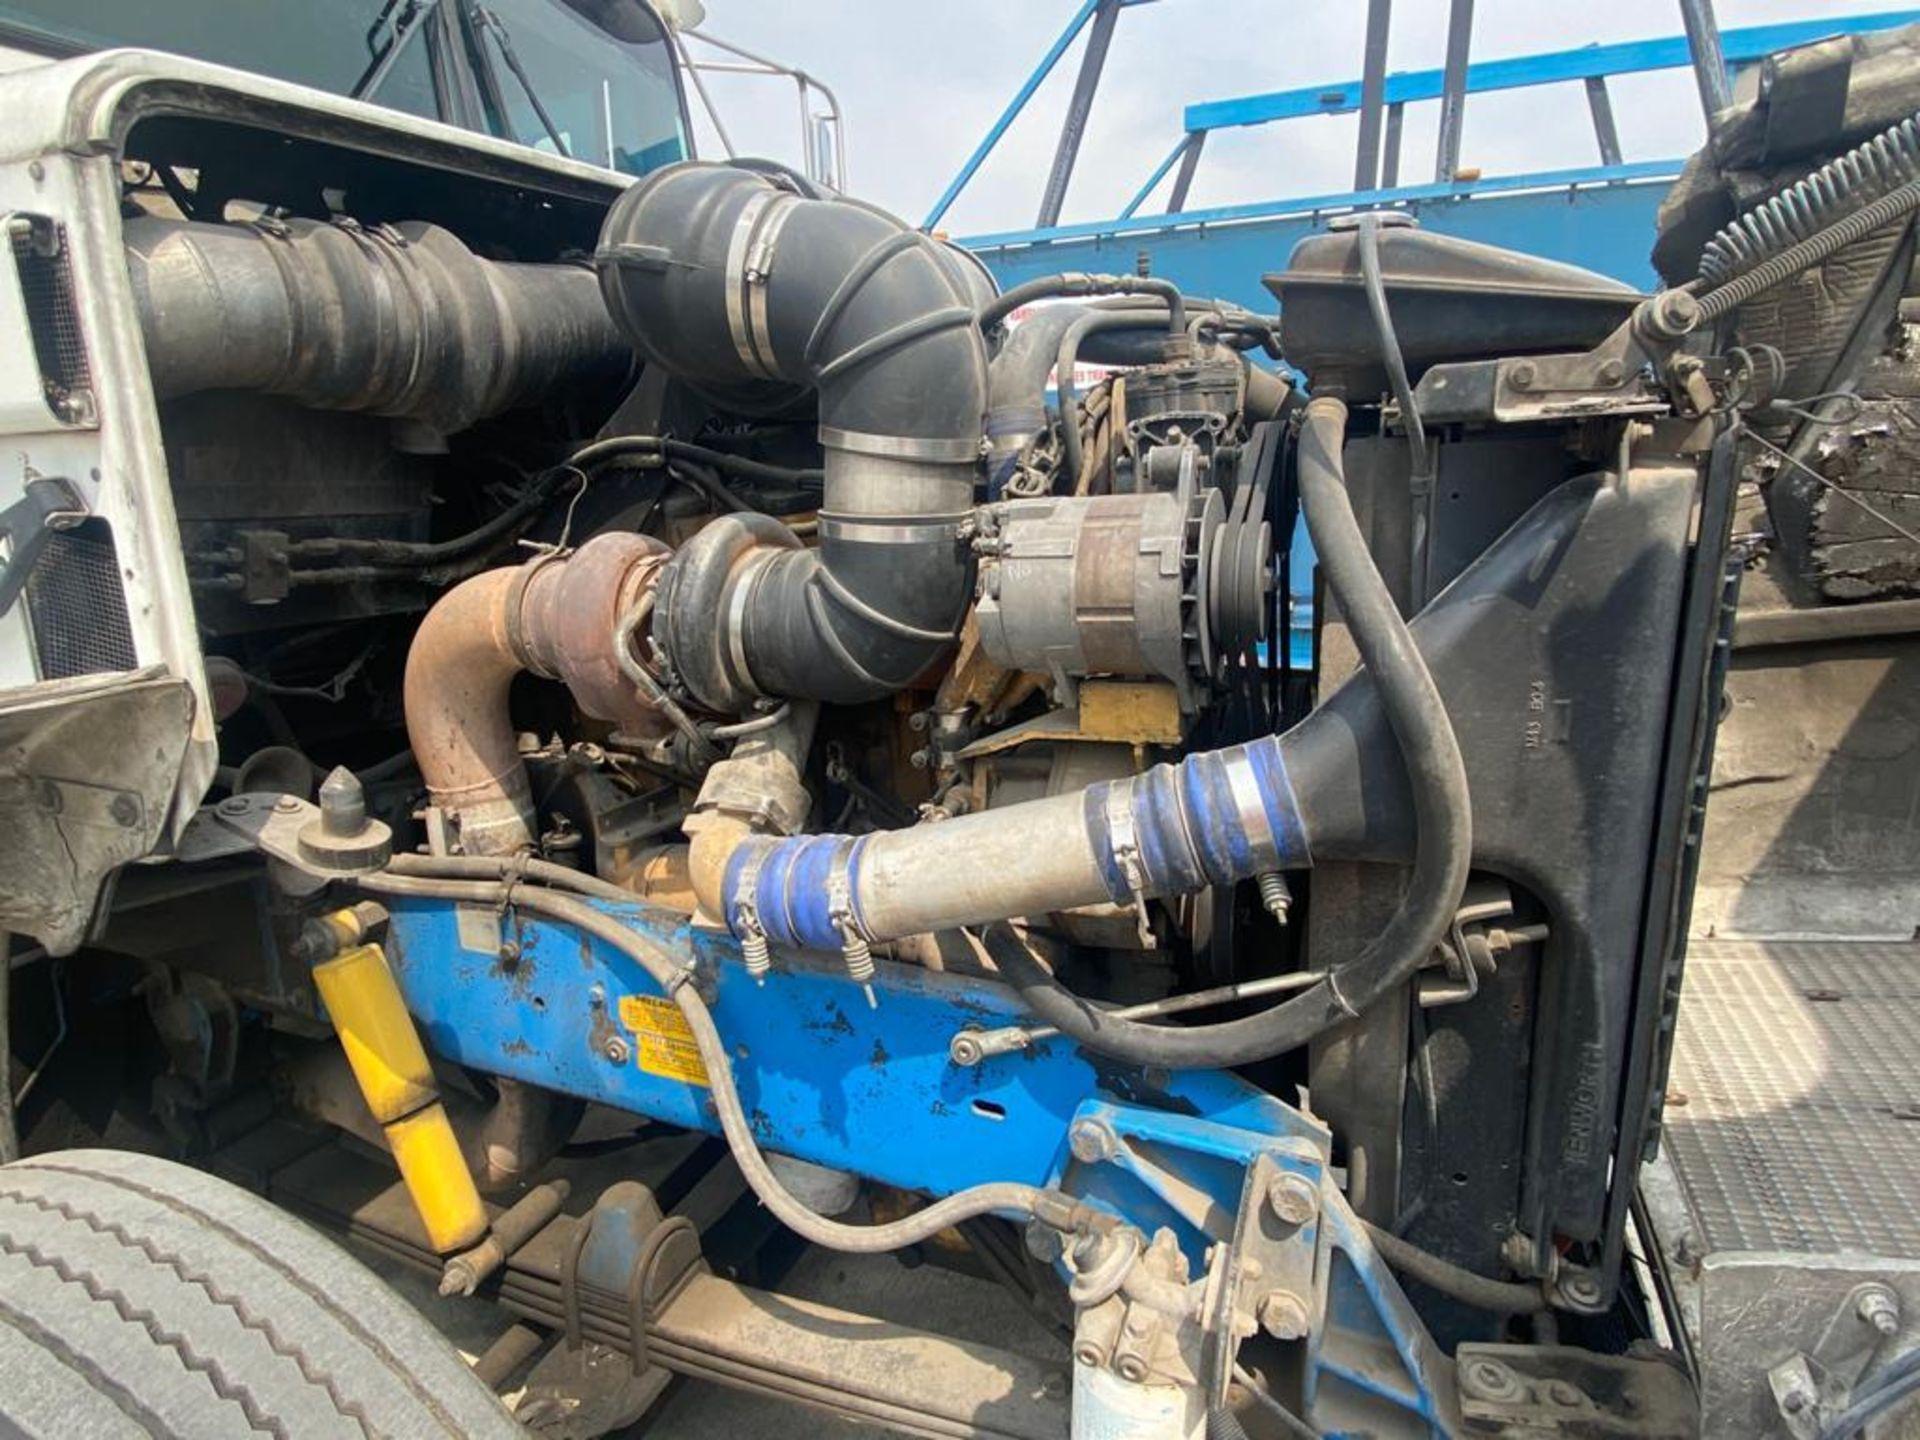 1999 Kenworth Sleeper truck tractor, standard transmission of 18 speeds - Image 53 of 62